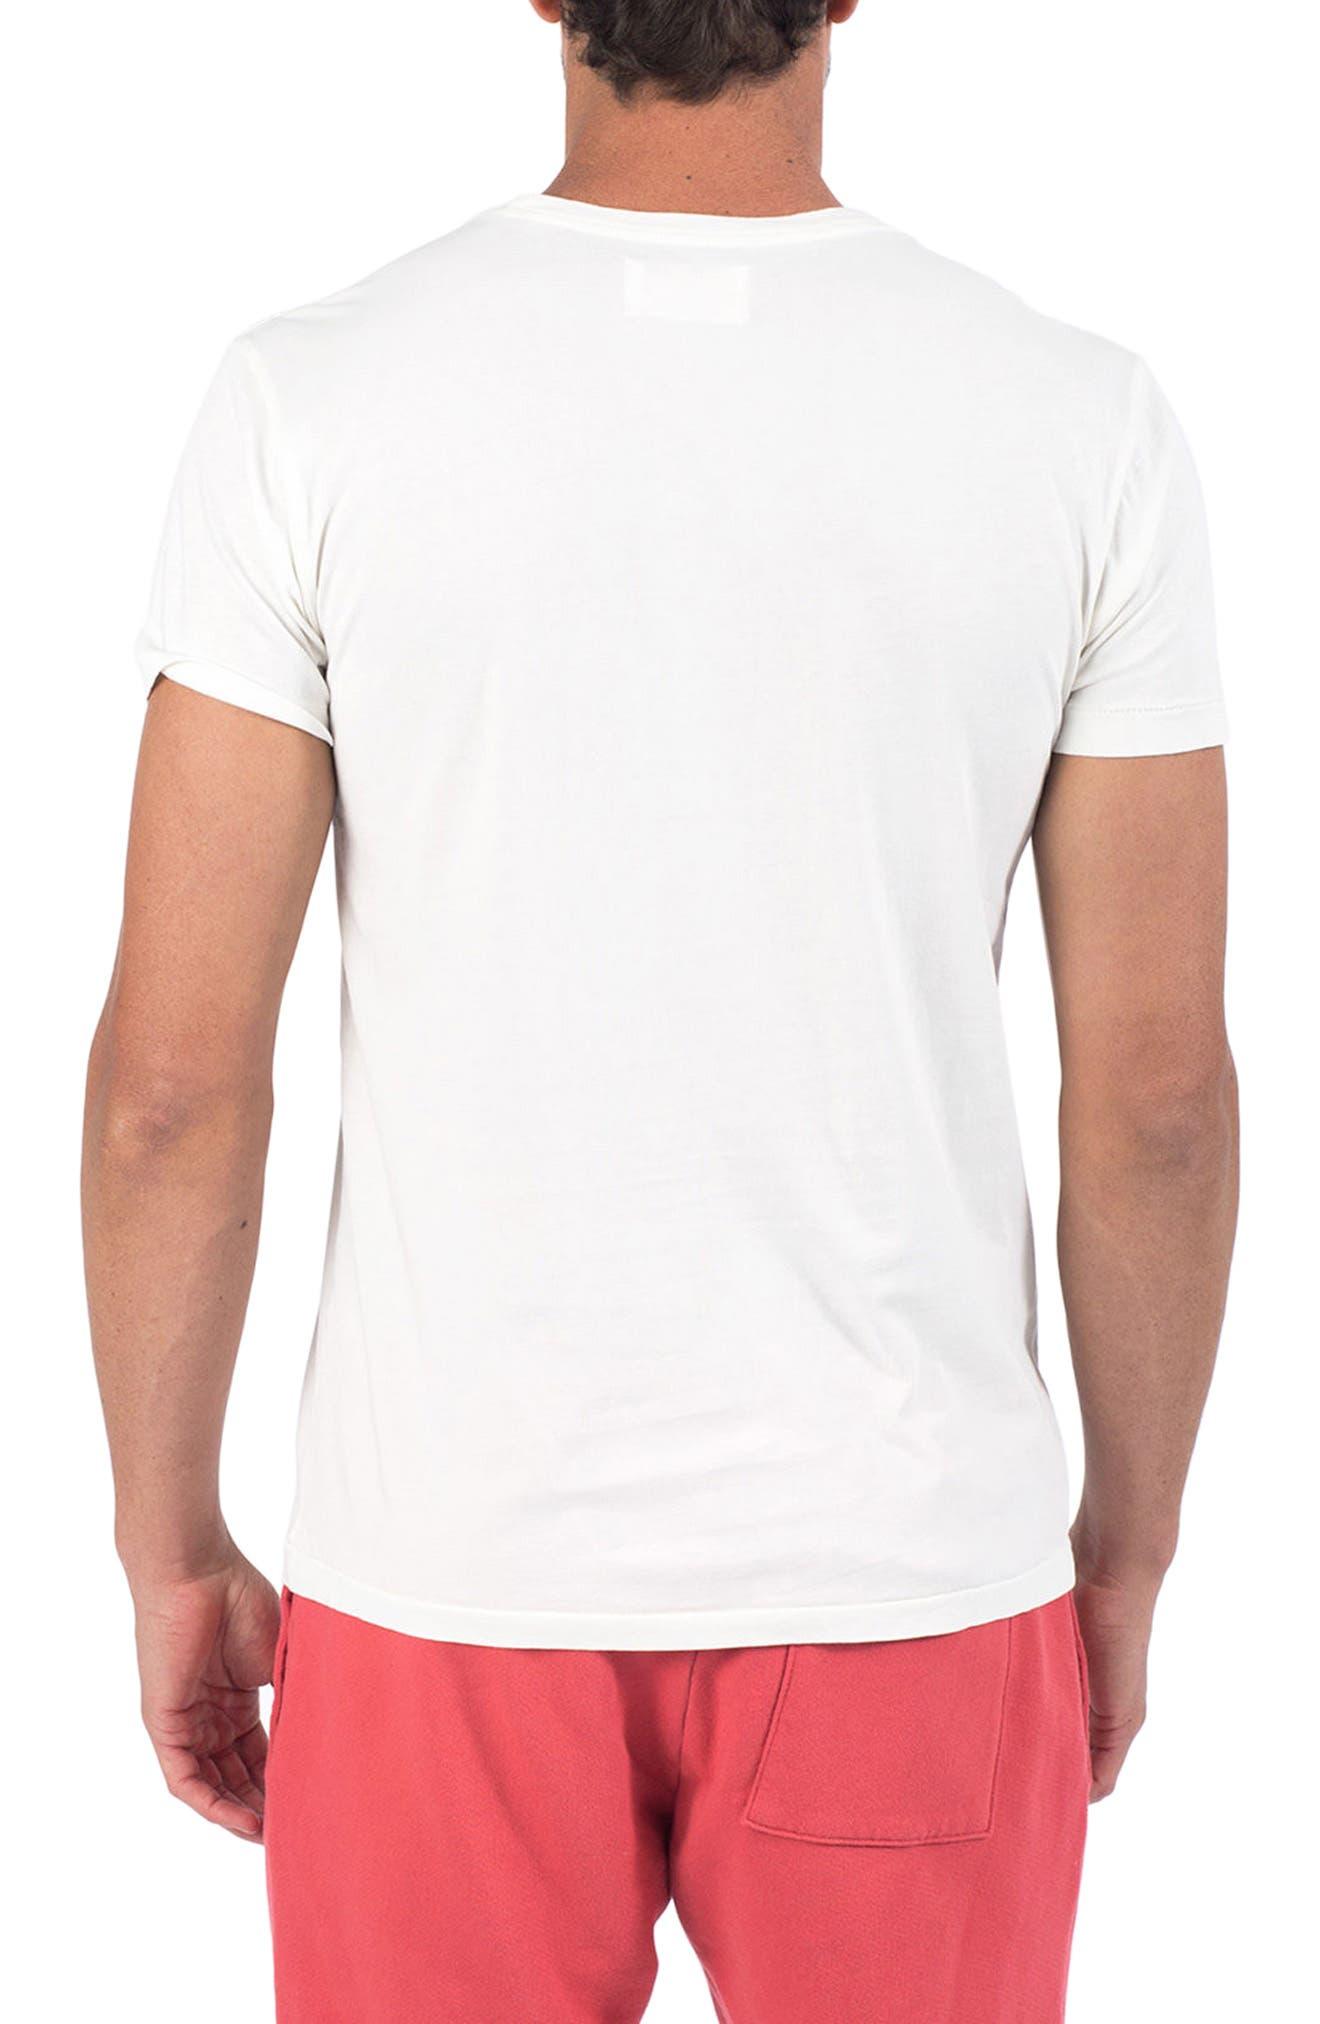 Cuba Libre T-Shirt,                             Alternate thumbnail 2, color,                             D White